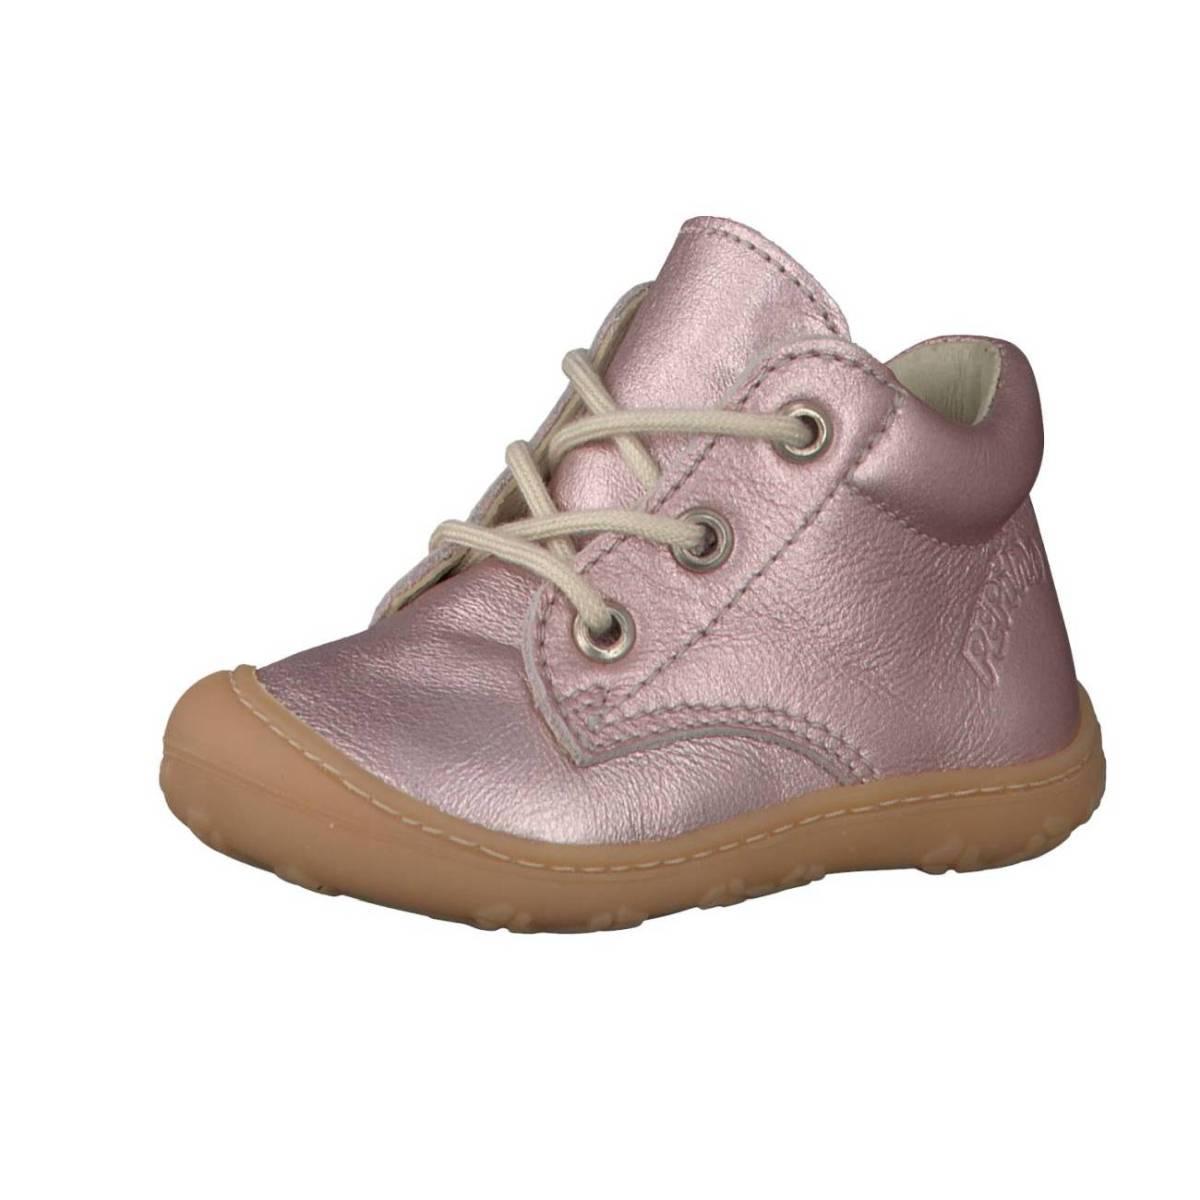 Ricosta Pepino Corbi rose glänzend rose metallic Lauflernschuhe Stiefel Kinder